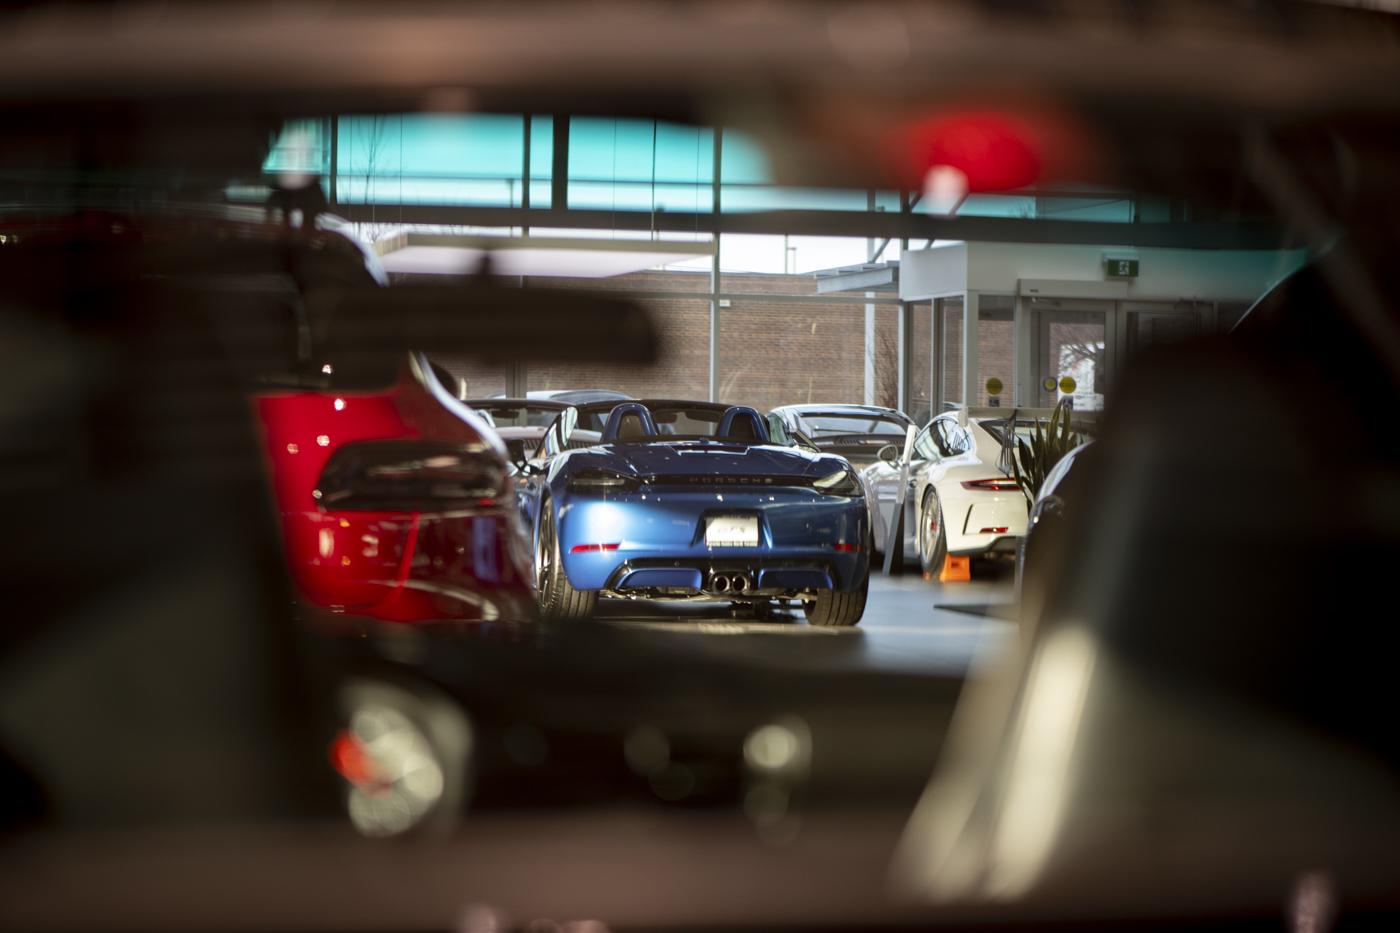 Porsche Centre North Toronto: An Exemplary Dealership Experience